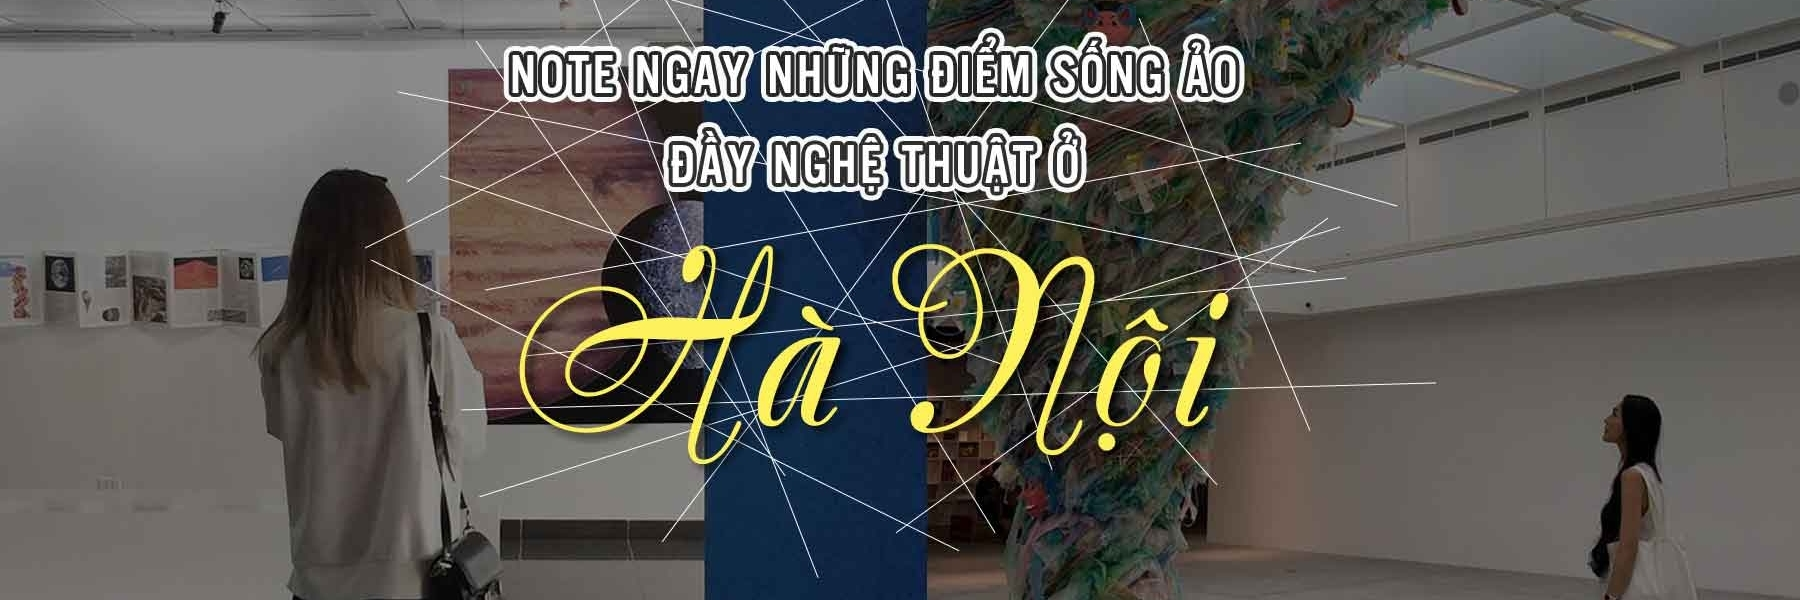 https://gody.vn/blog/lifeandgostudio4271/post/neu-me-song-ao-hay-note-lai-ngay-nhung-khong-gian-day-nghe-thuat-o-ha-noi-4833